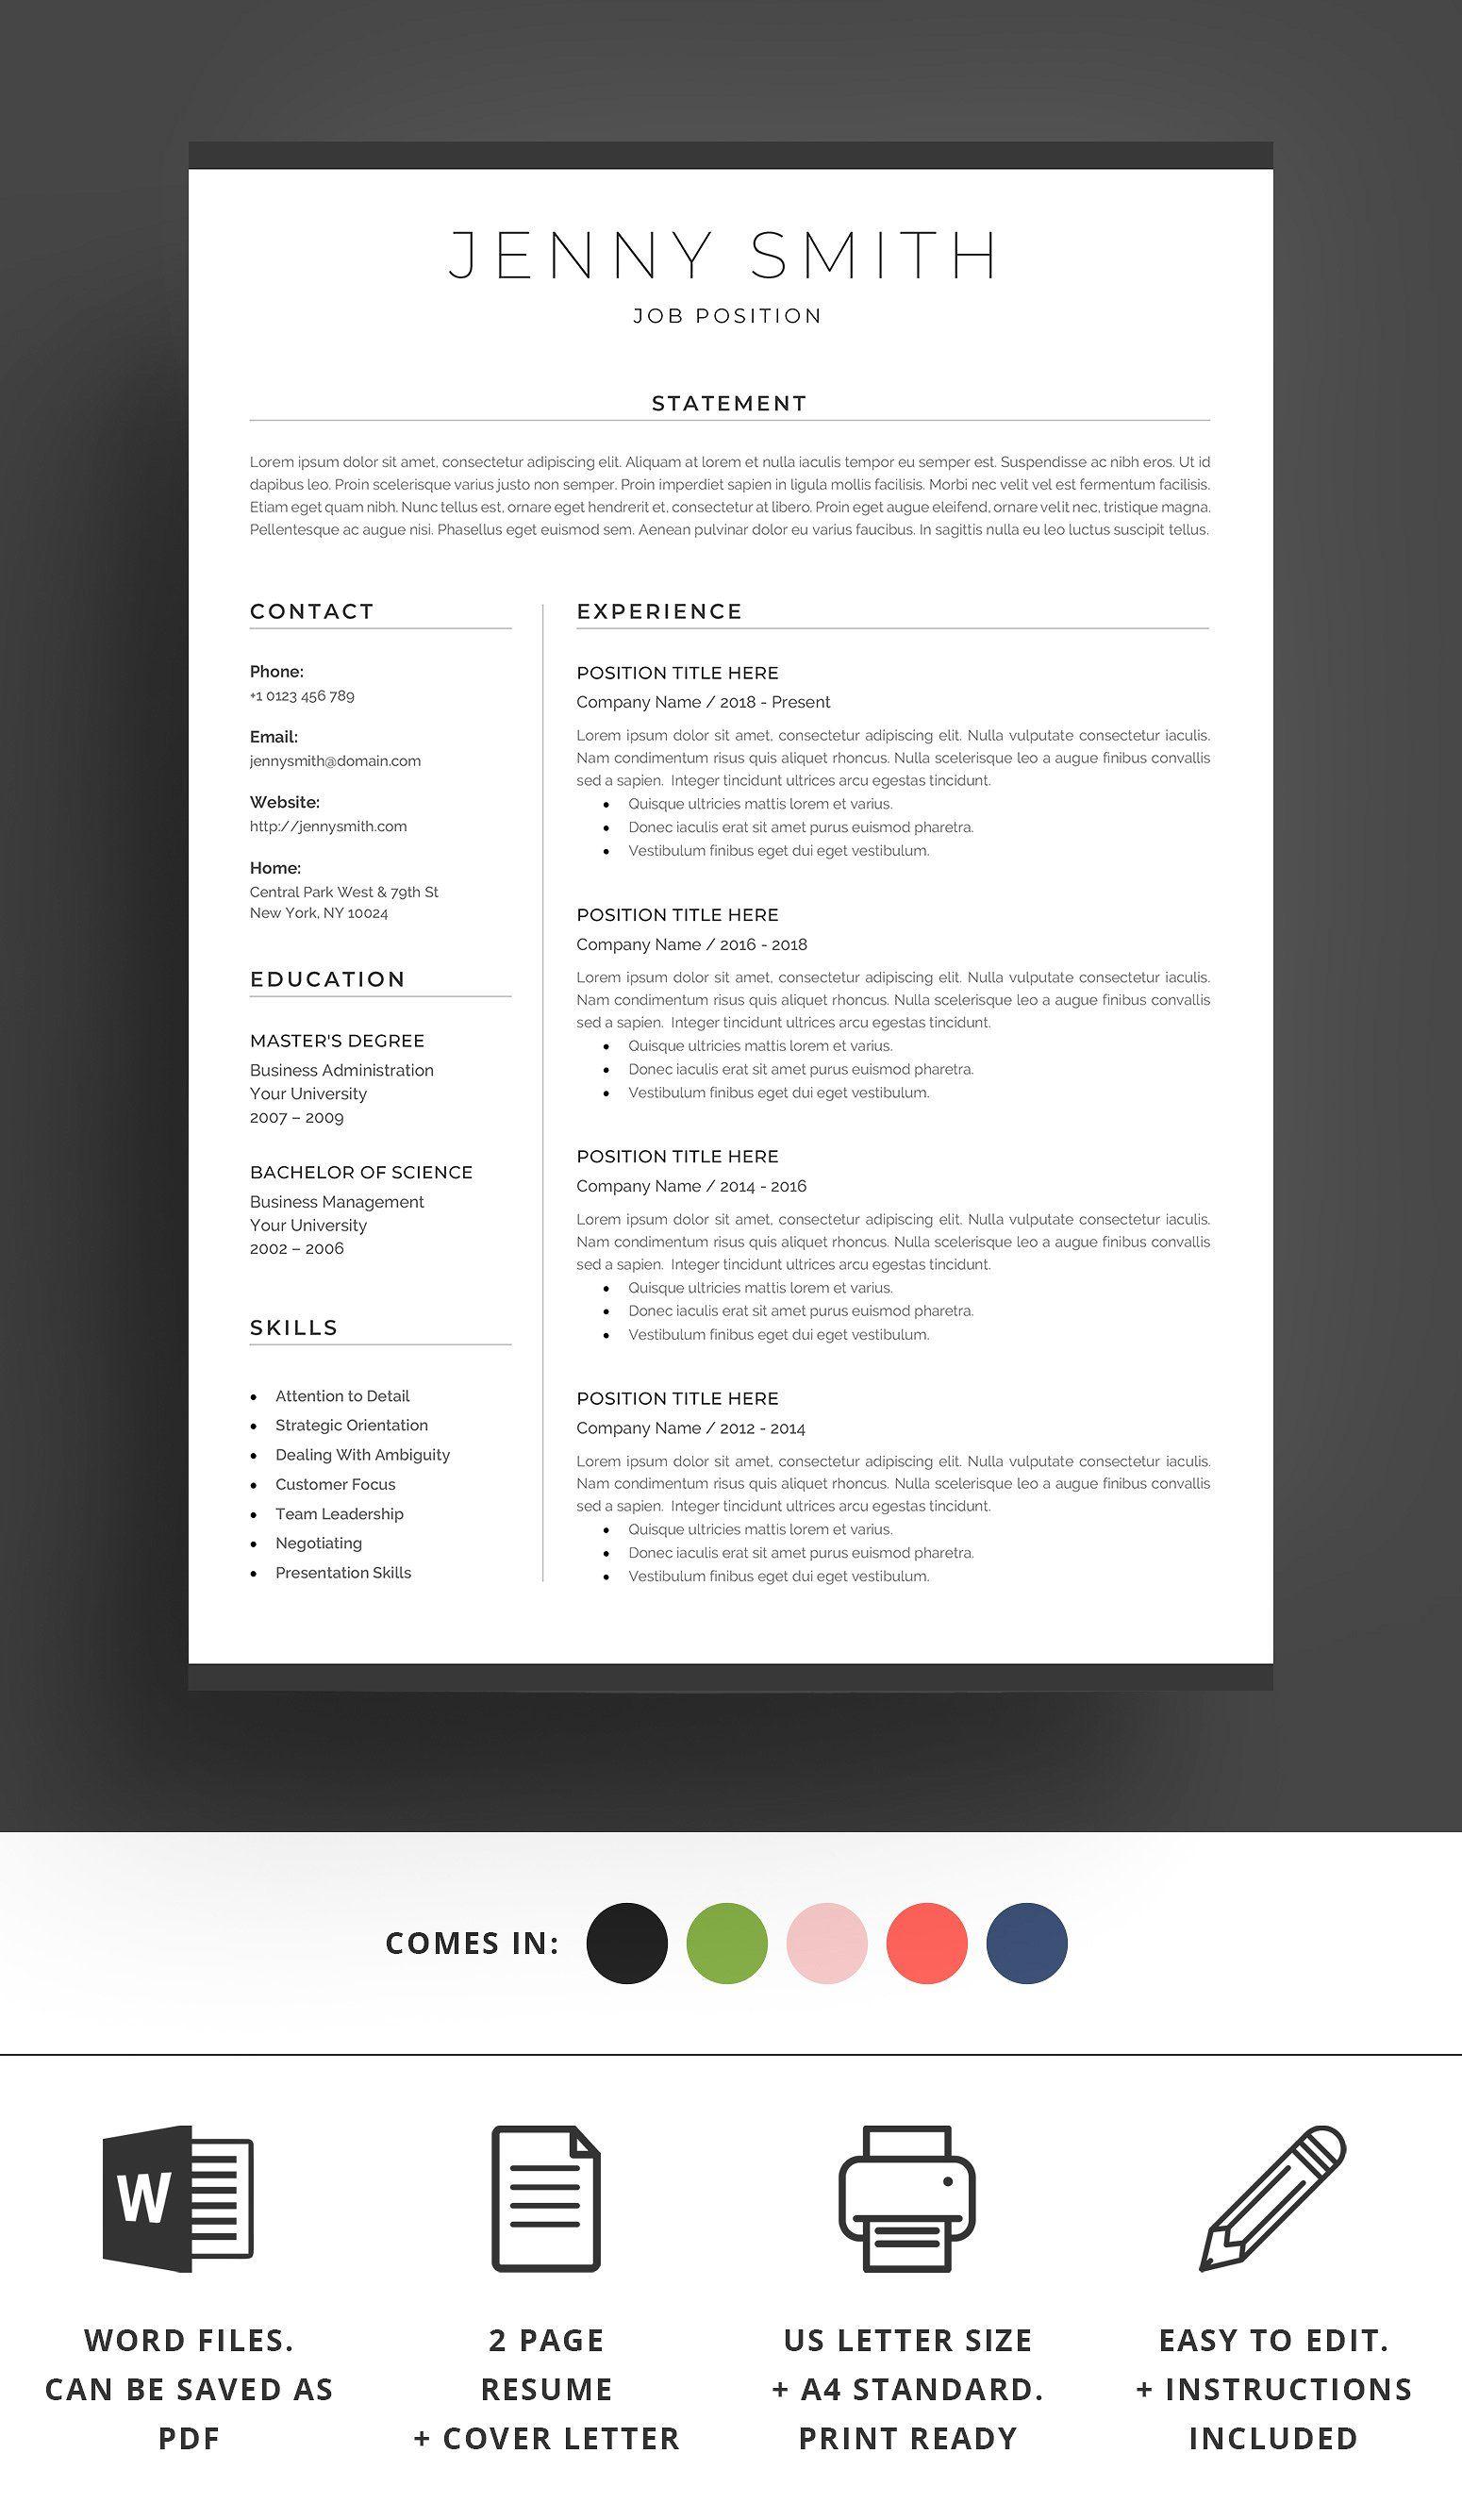 Resume Template Word Modern Clean Cv Ready Docx Files Print Resume Template Word Resume Template Resume Words